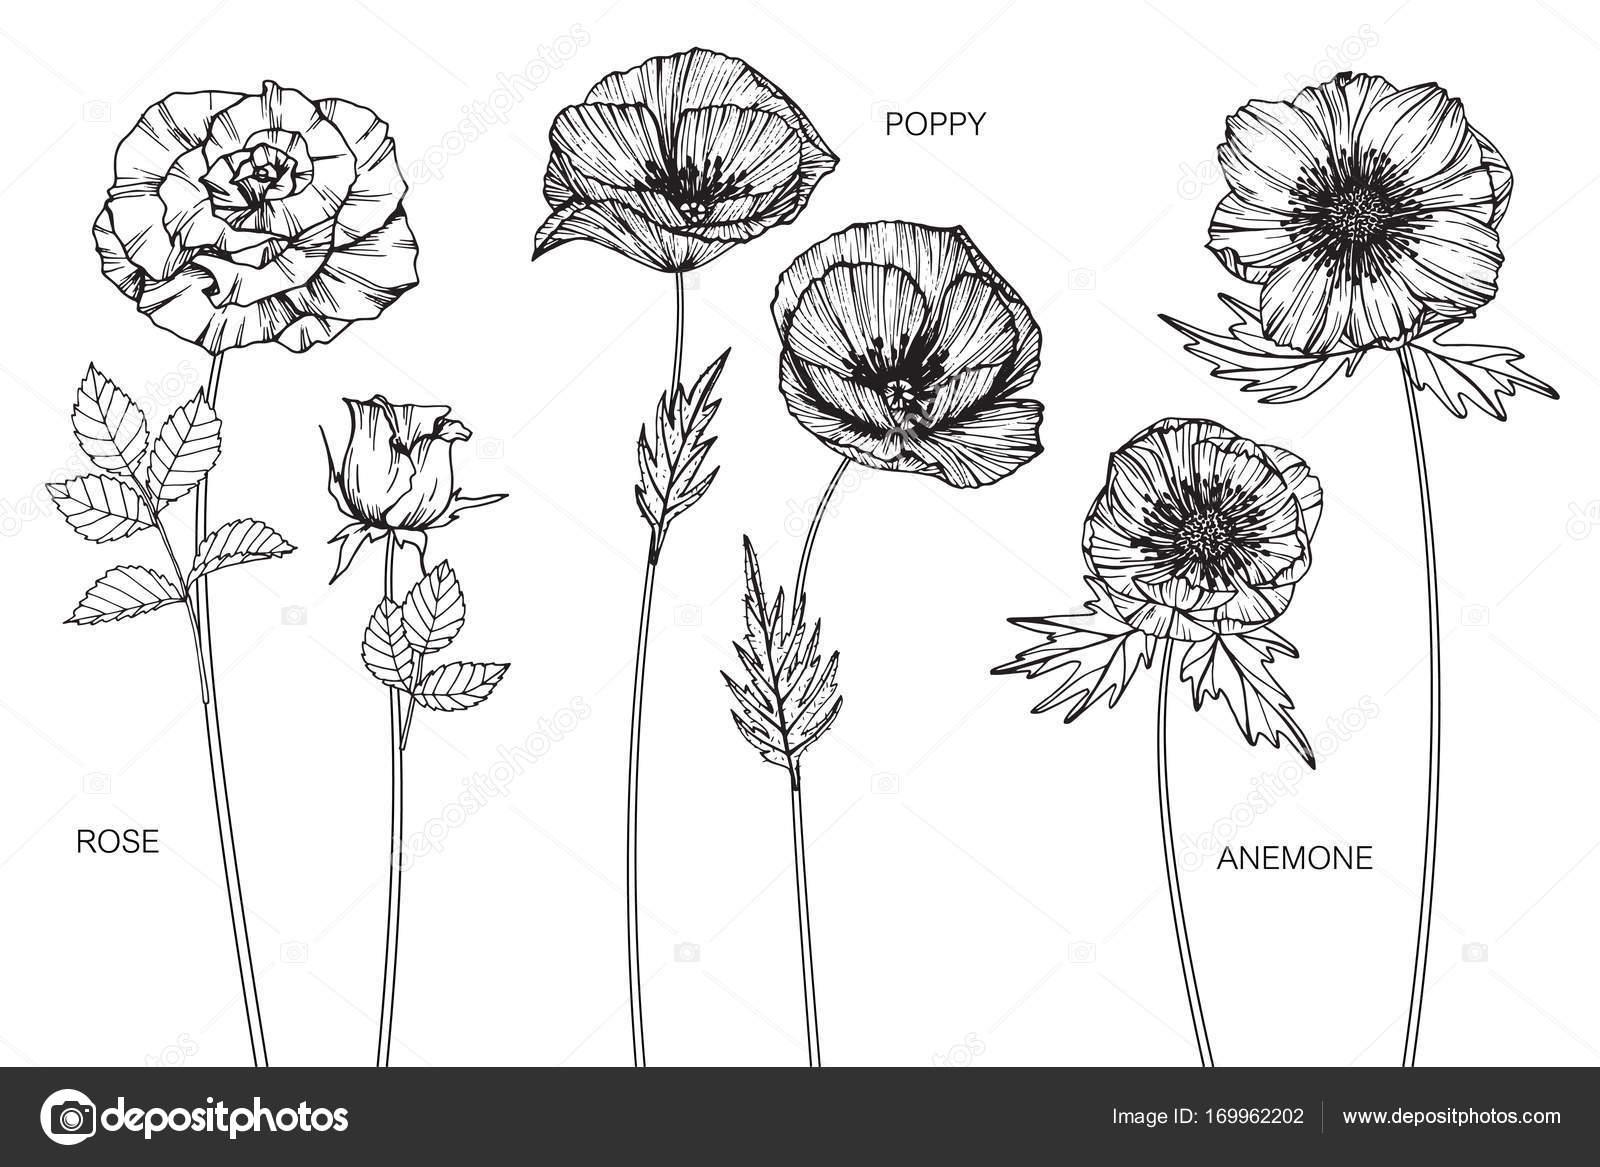 Ruze Vlci Mak Anemone Kvetina Kresba A Nacrt S Cernobilou